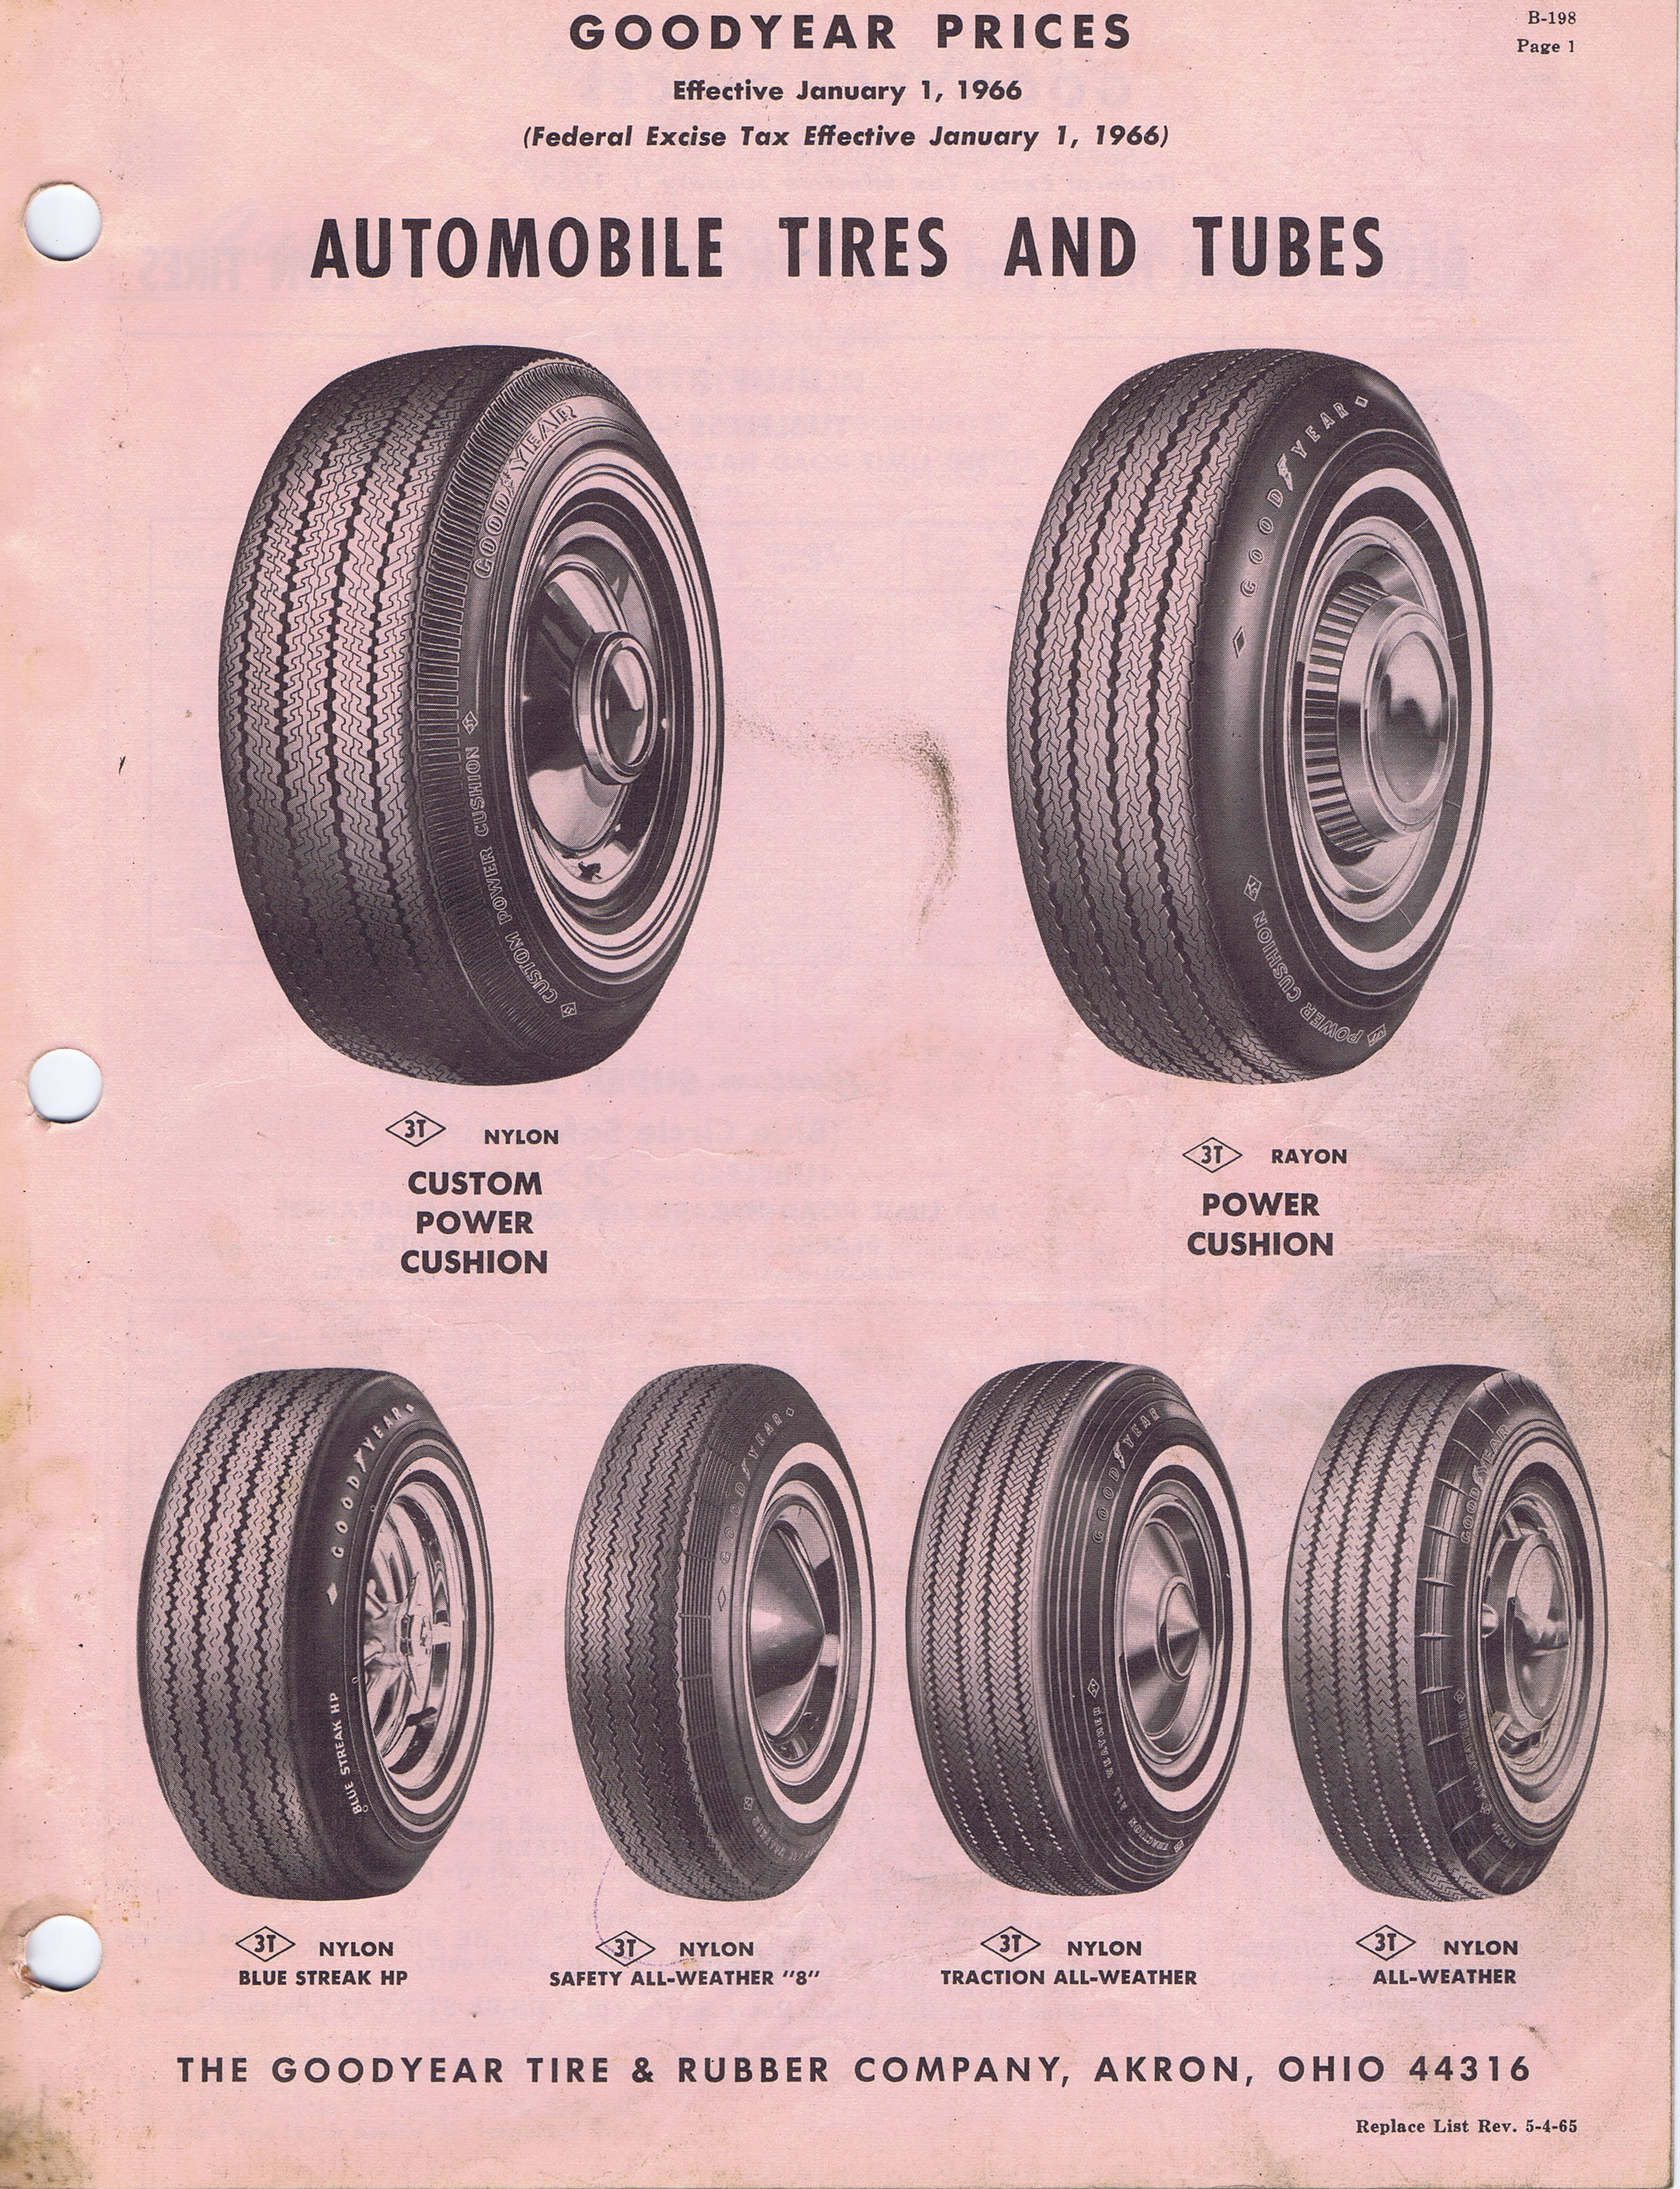 Goodyear Car >> 1966 Goodyear Passenger Price List / Goodyear_Pass ...